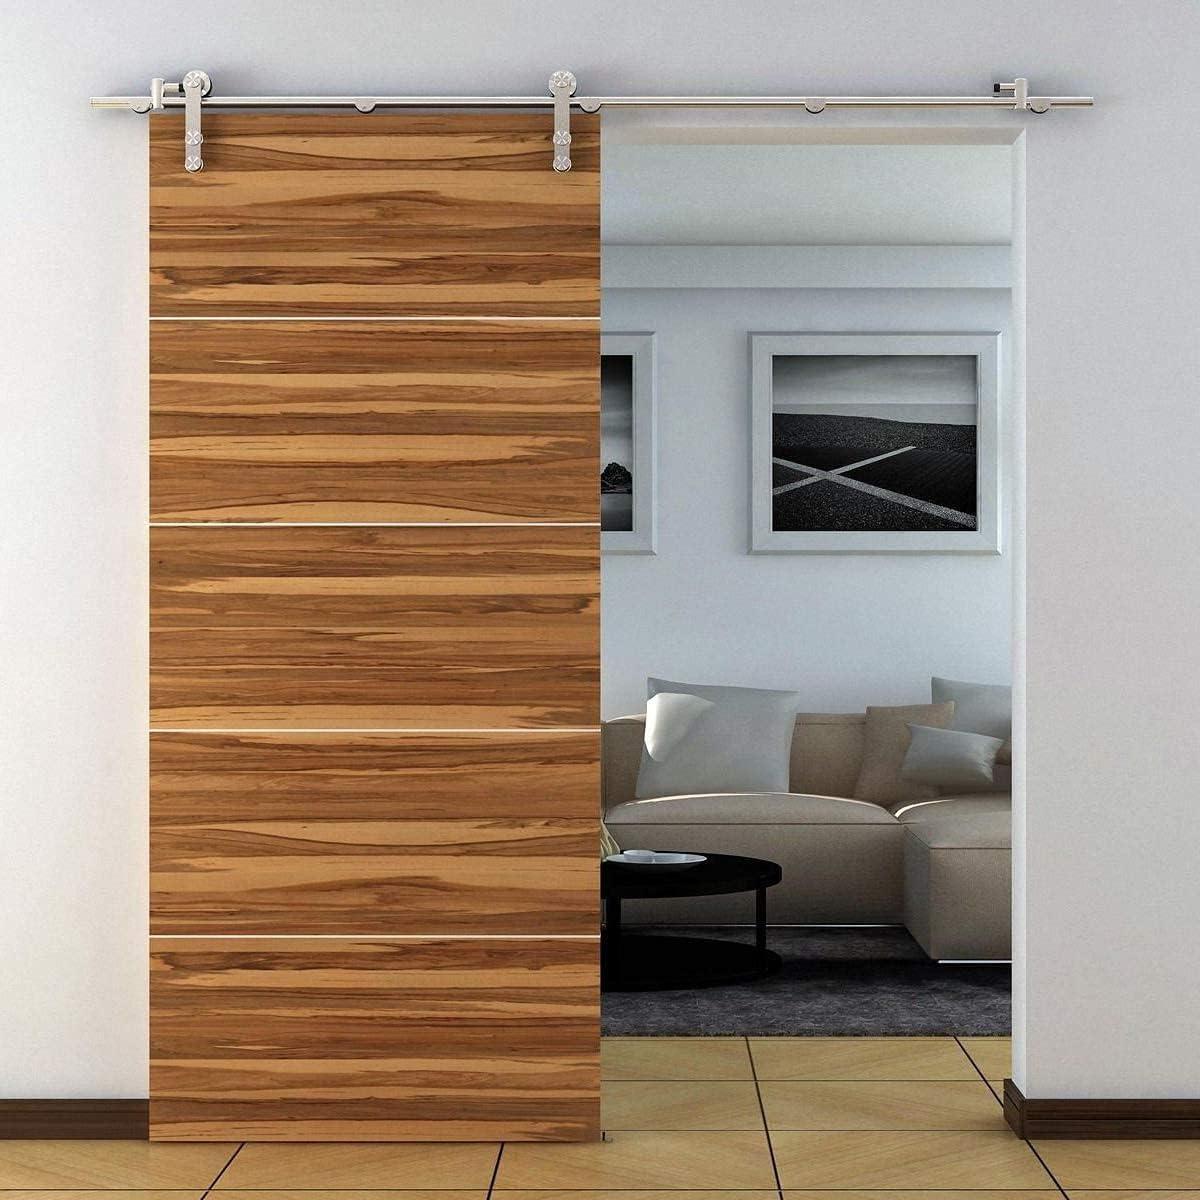 KINMADE セール特別価格 Stainless Steel I-Shape Contemporary Sliding H 期間限定送料無料 Door Barn